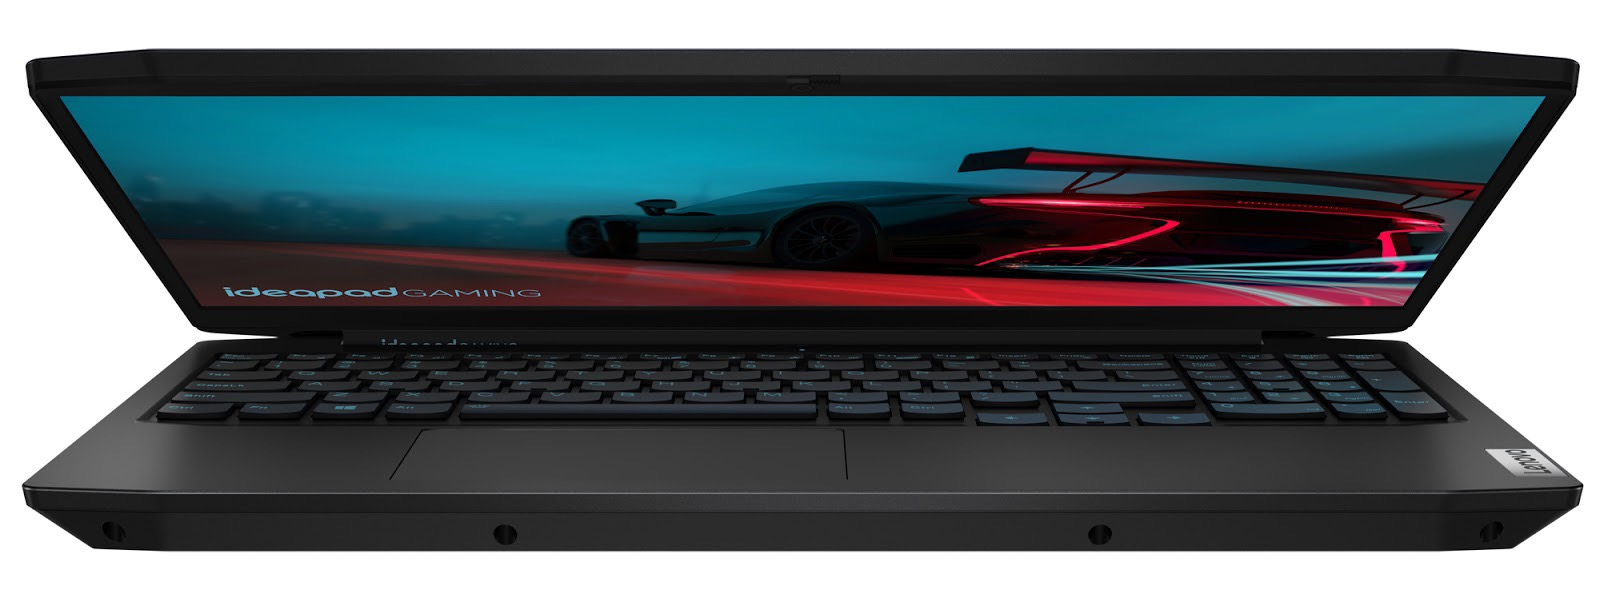 Фото 1. Ноутбук Lenovo ideapad Gaming 3 15IMH05 Onyx Black (81Y400TLRE)